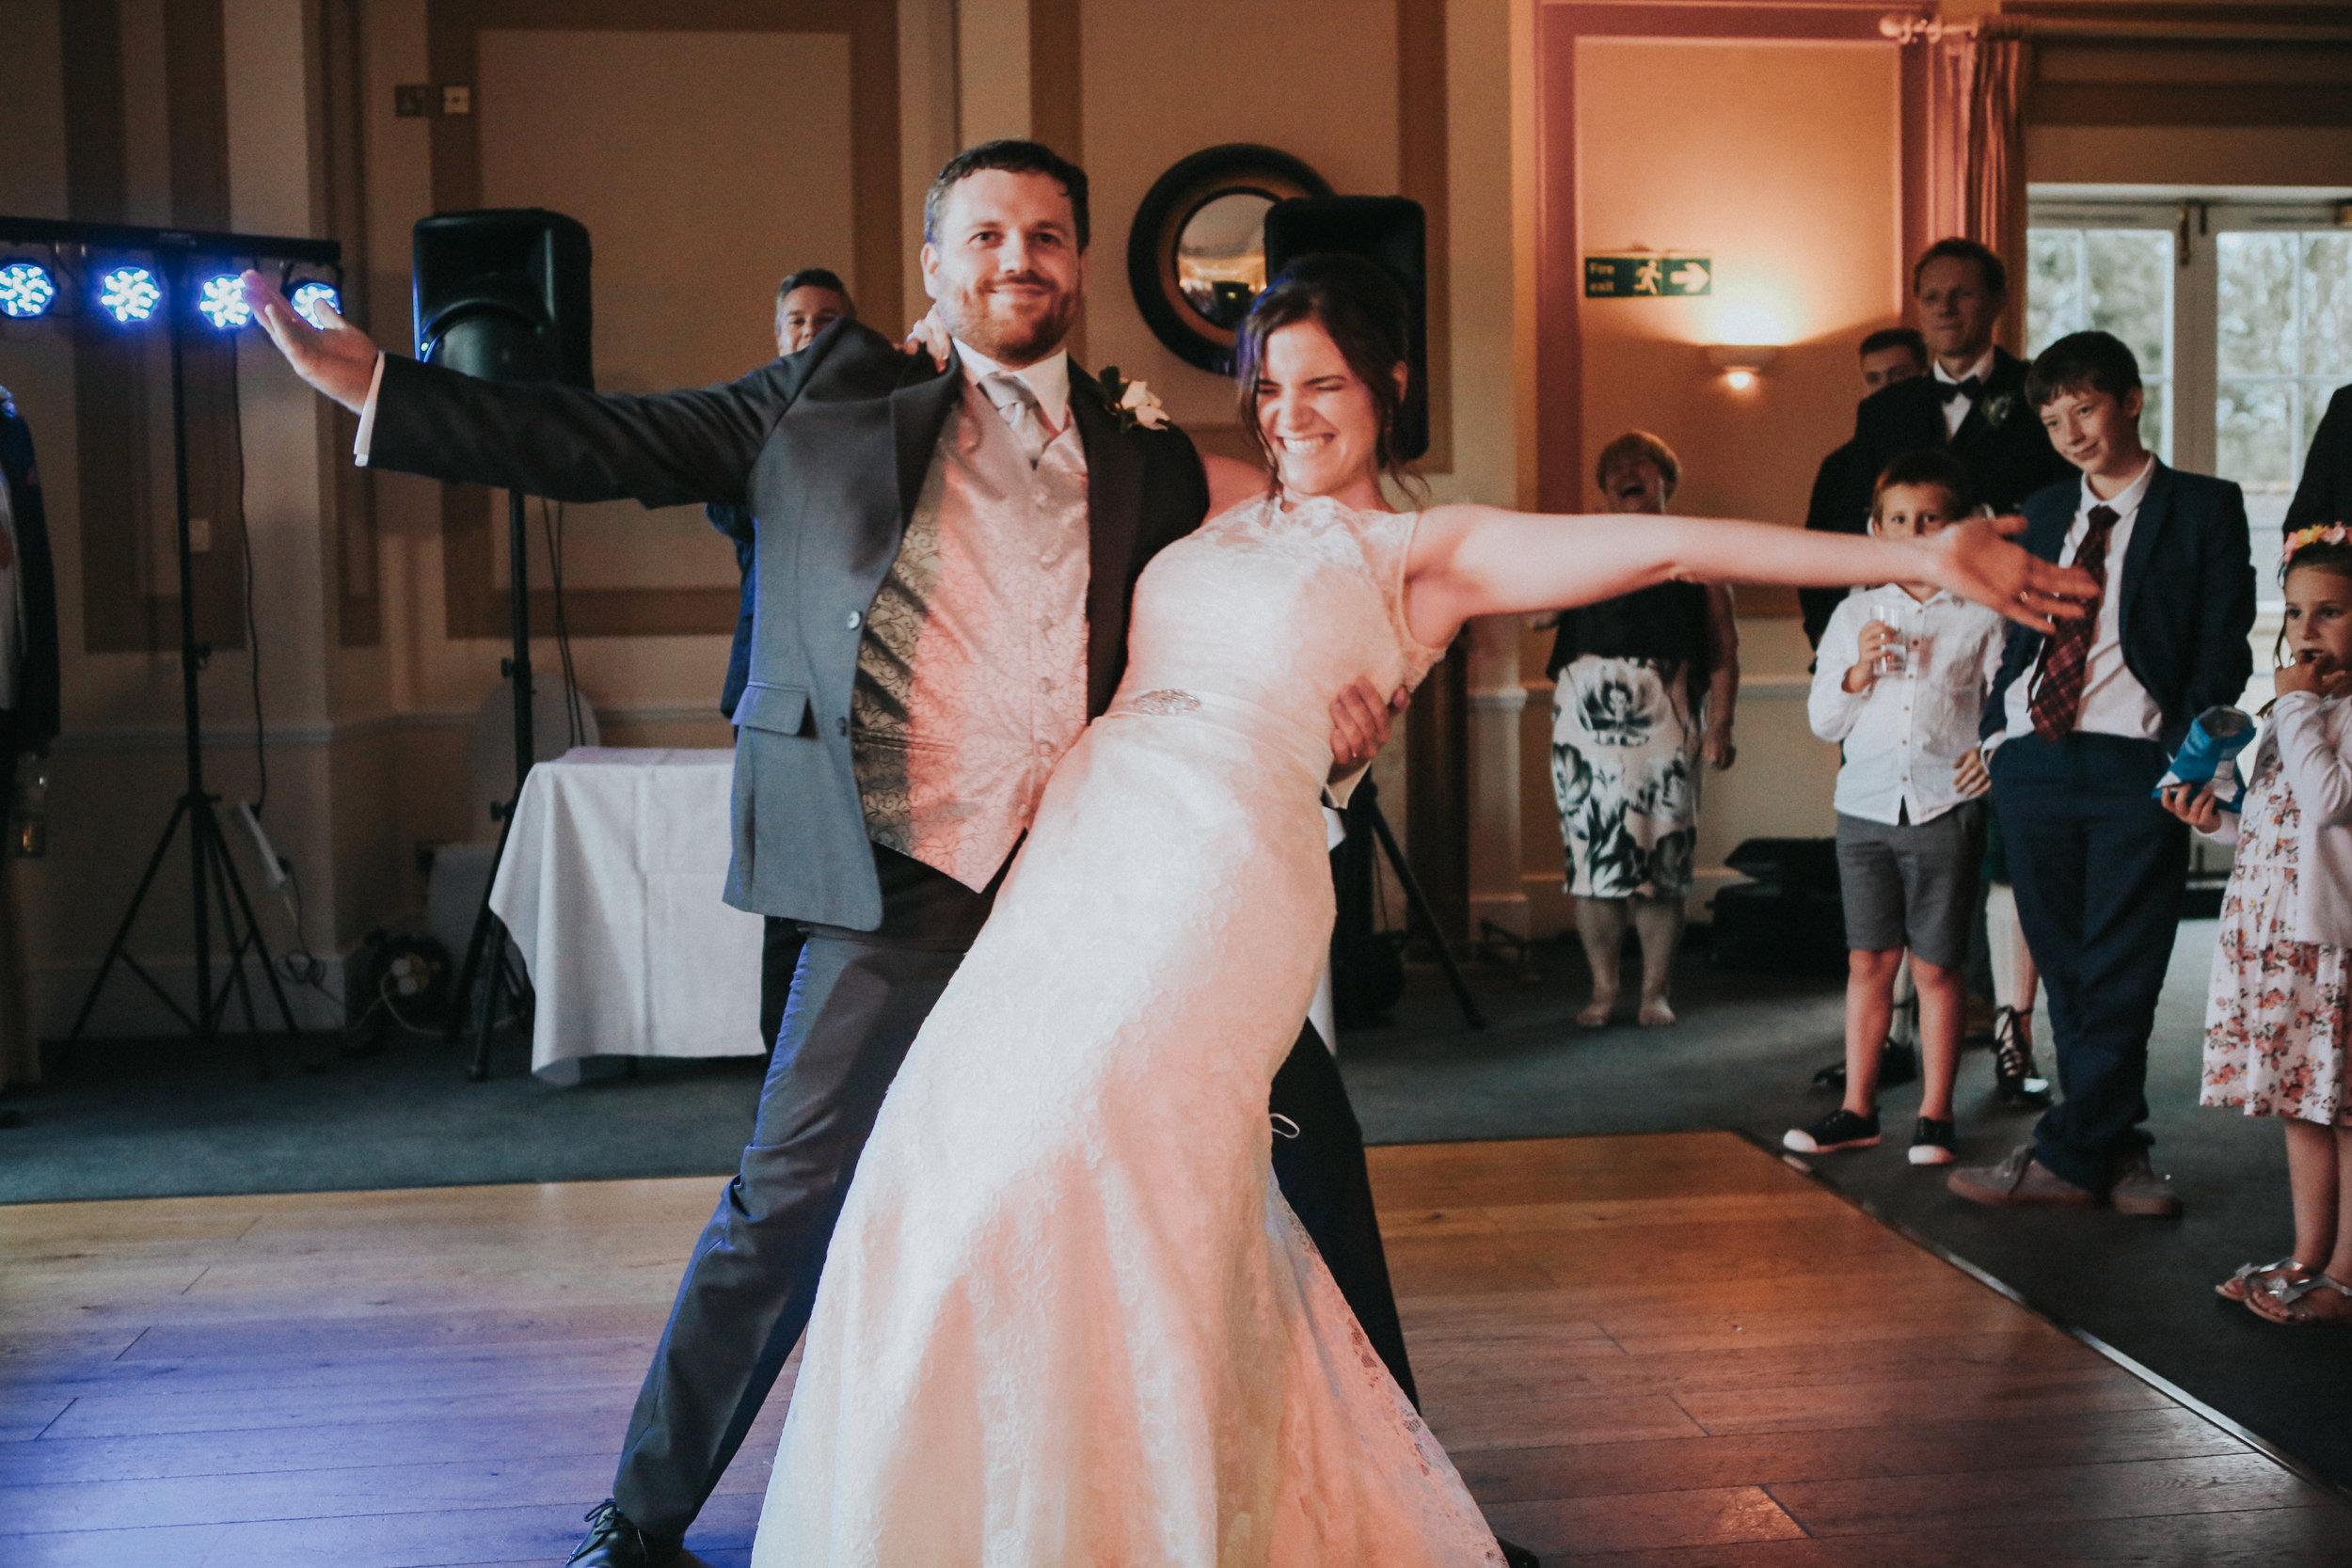 reigate-surrey-london-wedding-photography-group-formal-shot-reception-woldingham-golf-club-first-dance-109